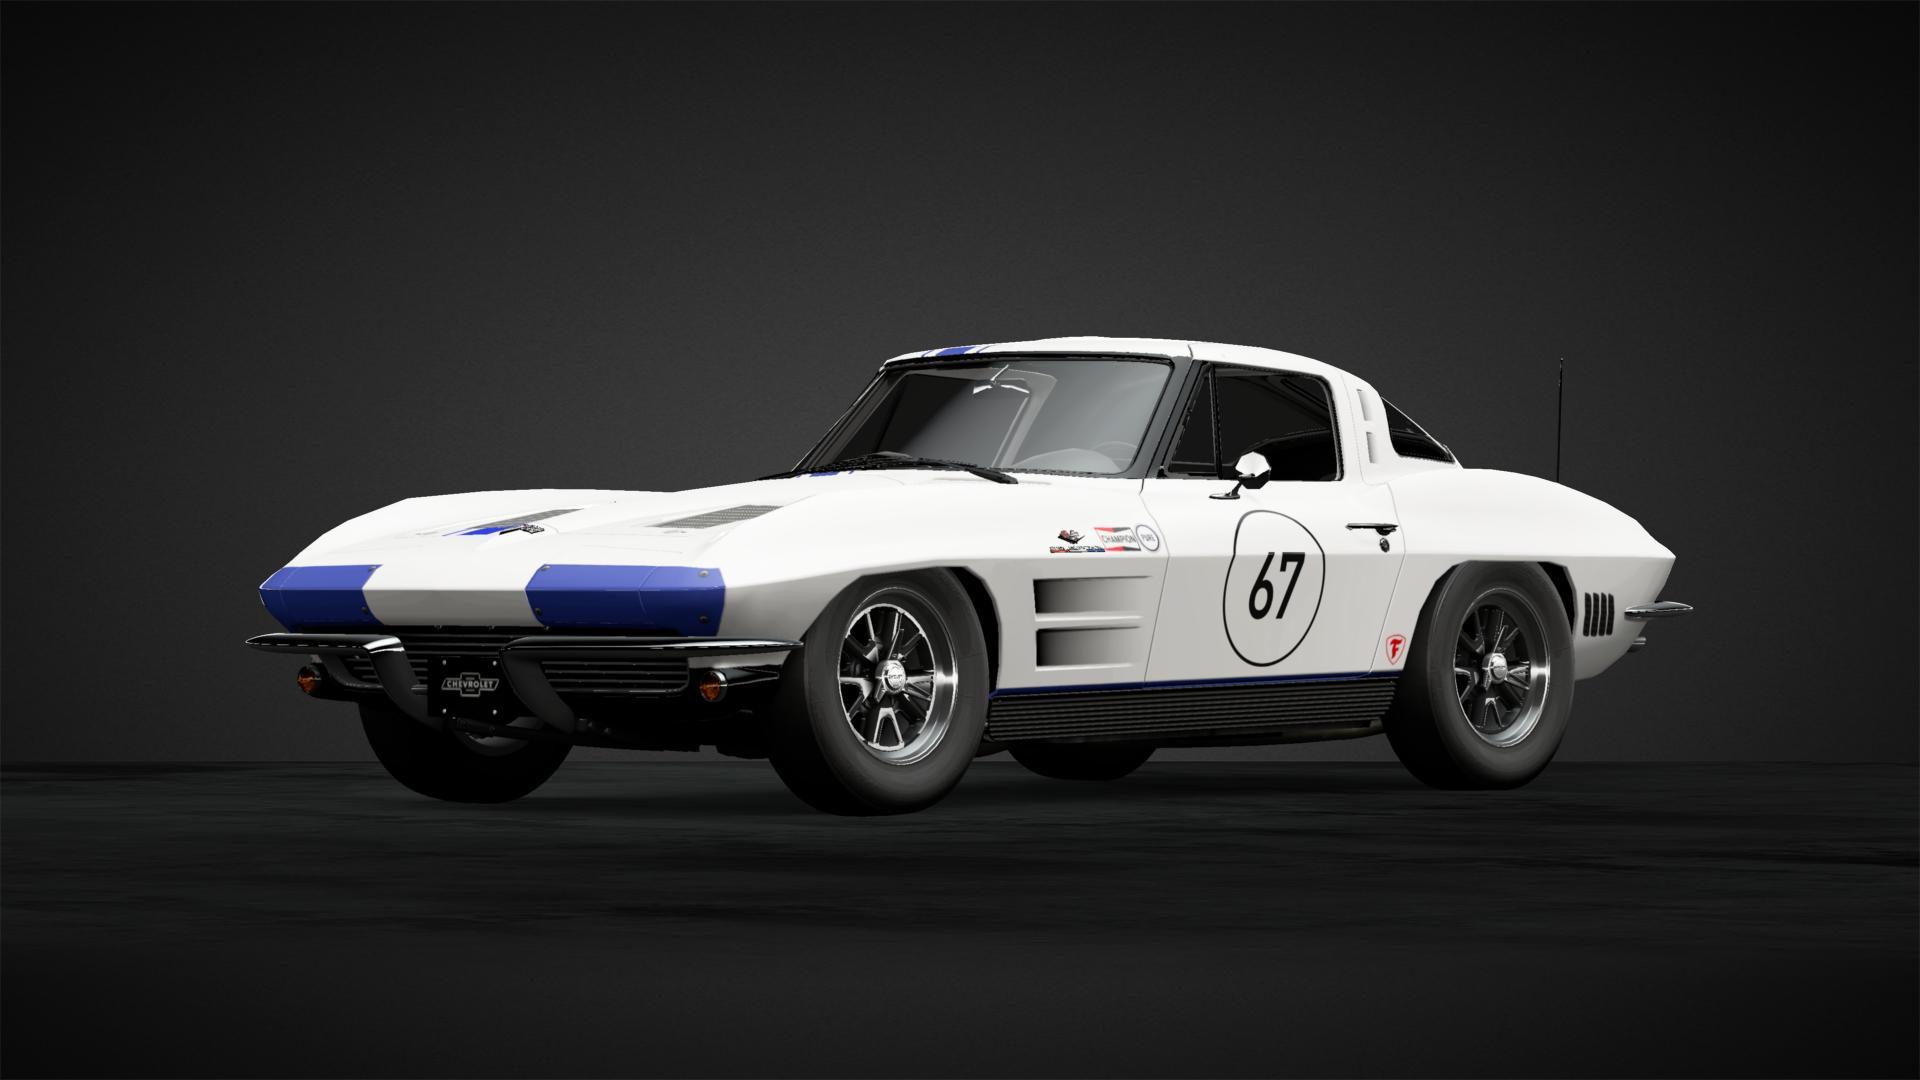 Grand Sport Sebring replica - Car Livery by gearmeister